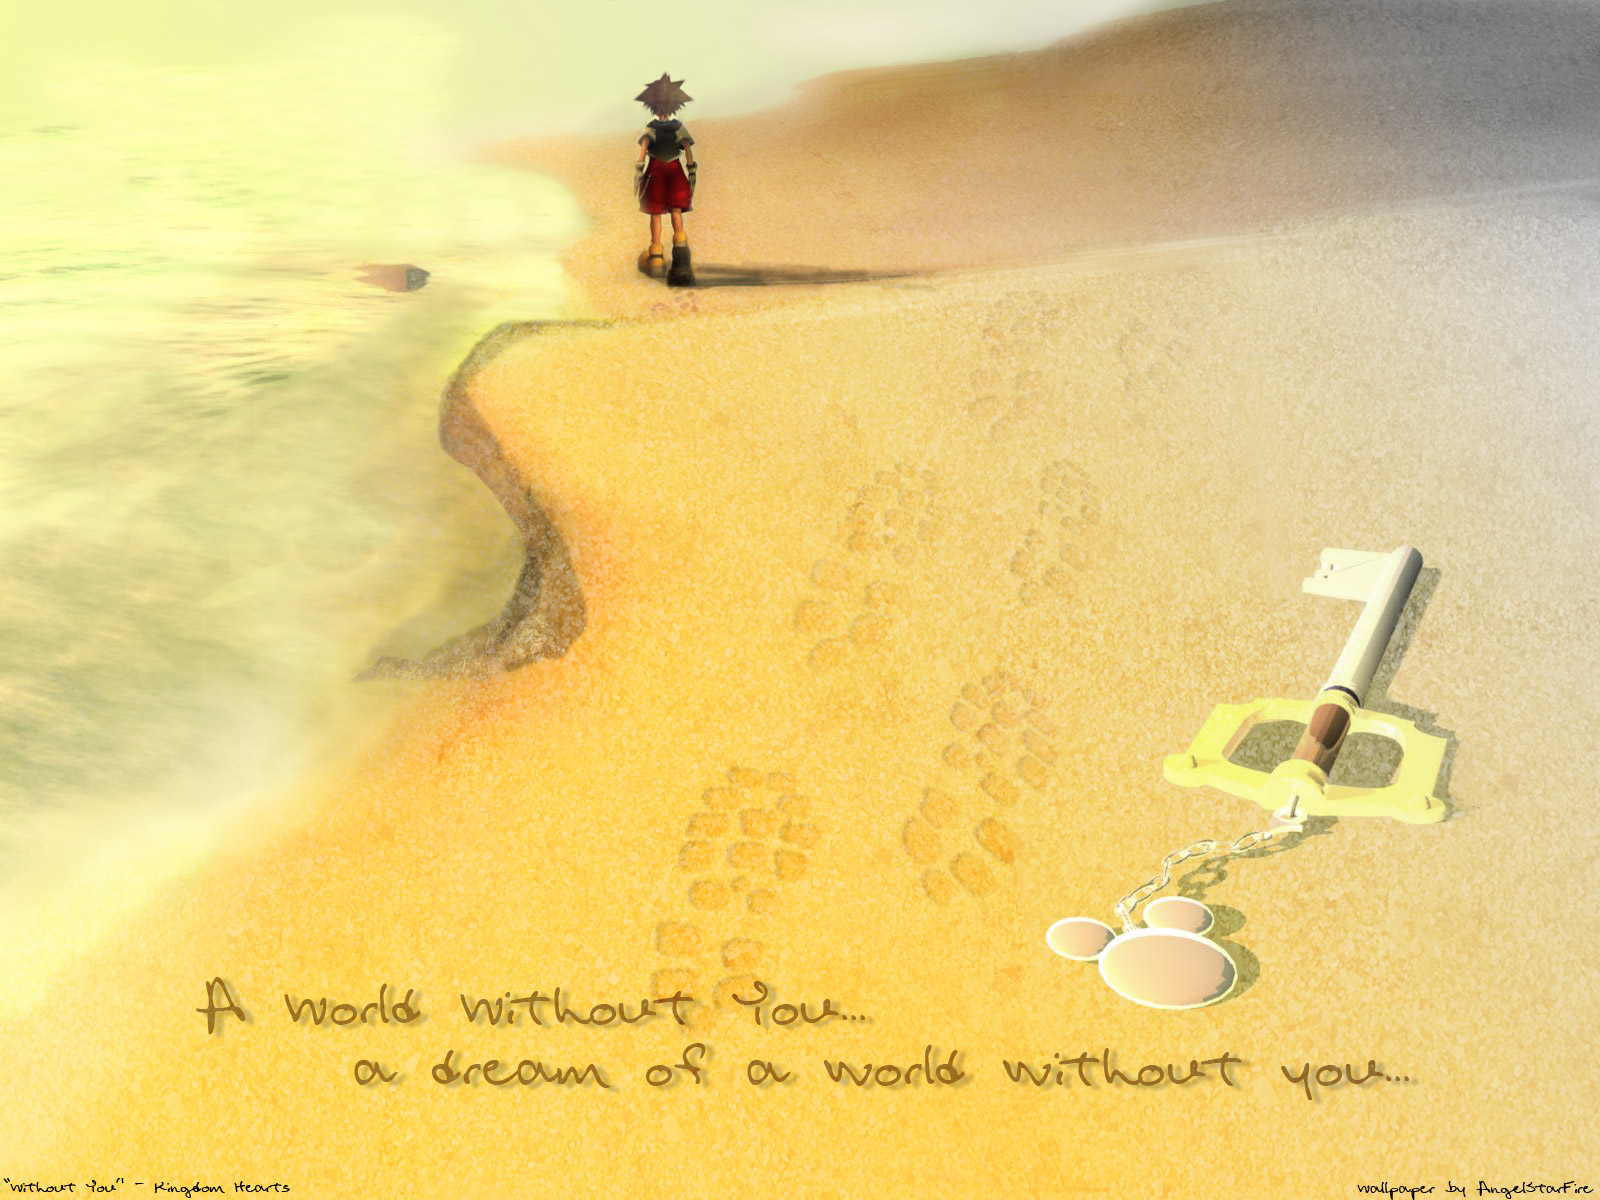 Kingdom Hearts Quotes Kingdom Hearts Wallpaper 932570  Zerochan Anime Image Board